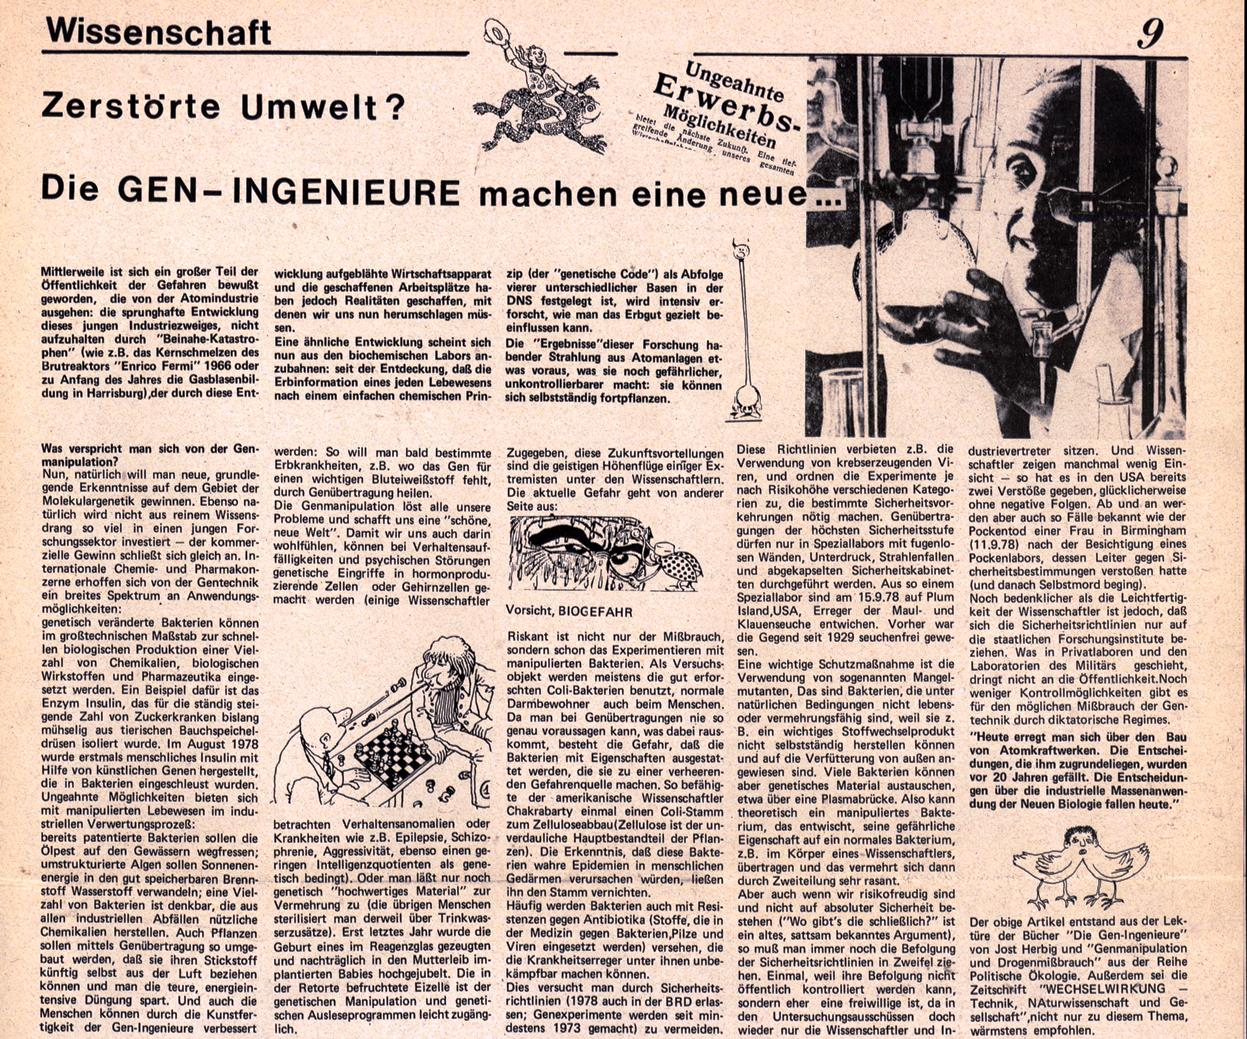 Muenster_Gruenes_Blatt_19791000_022_017